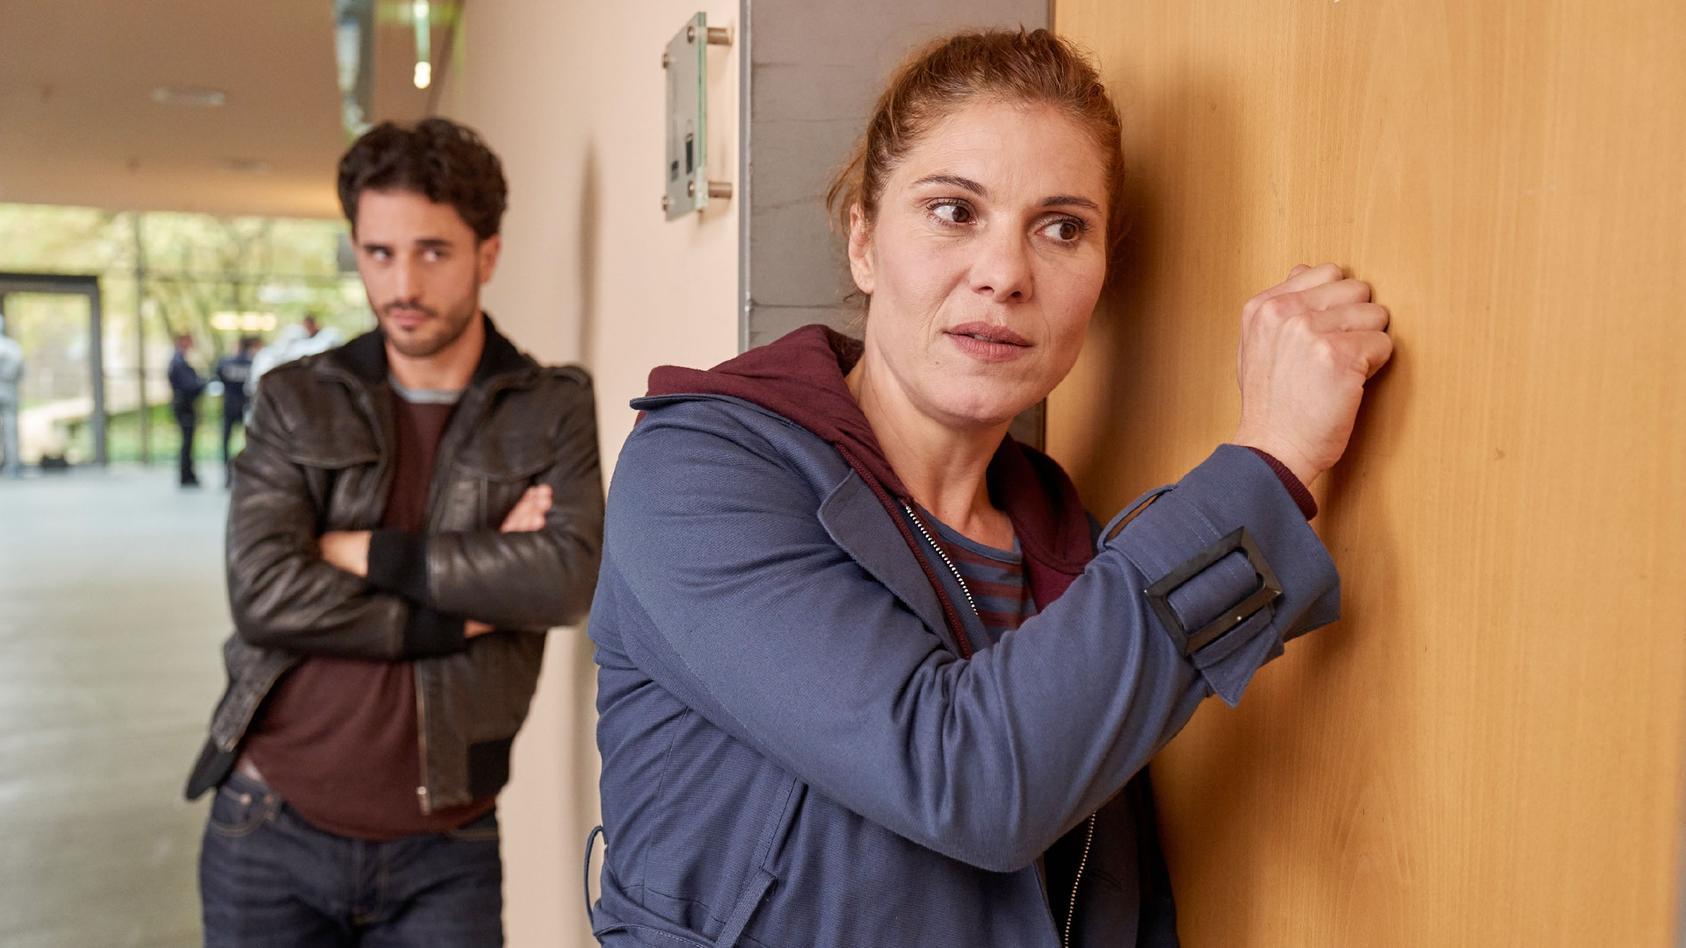 Polizeipsychologin Mina Bäumer (Yasmina Djaballah) und Thomas Waldeck (Jan Kittmann) ermitteln seit Februar auf RTL.